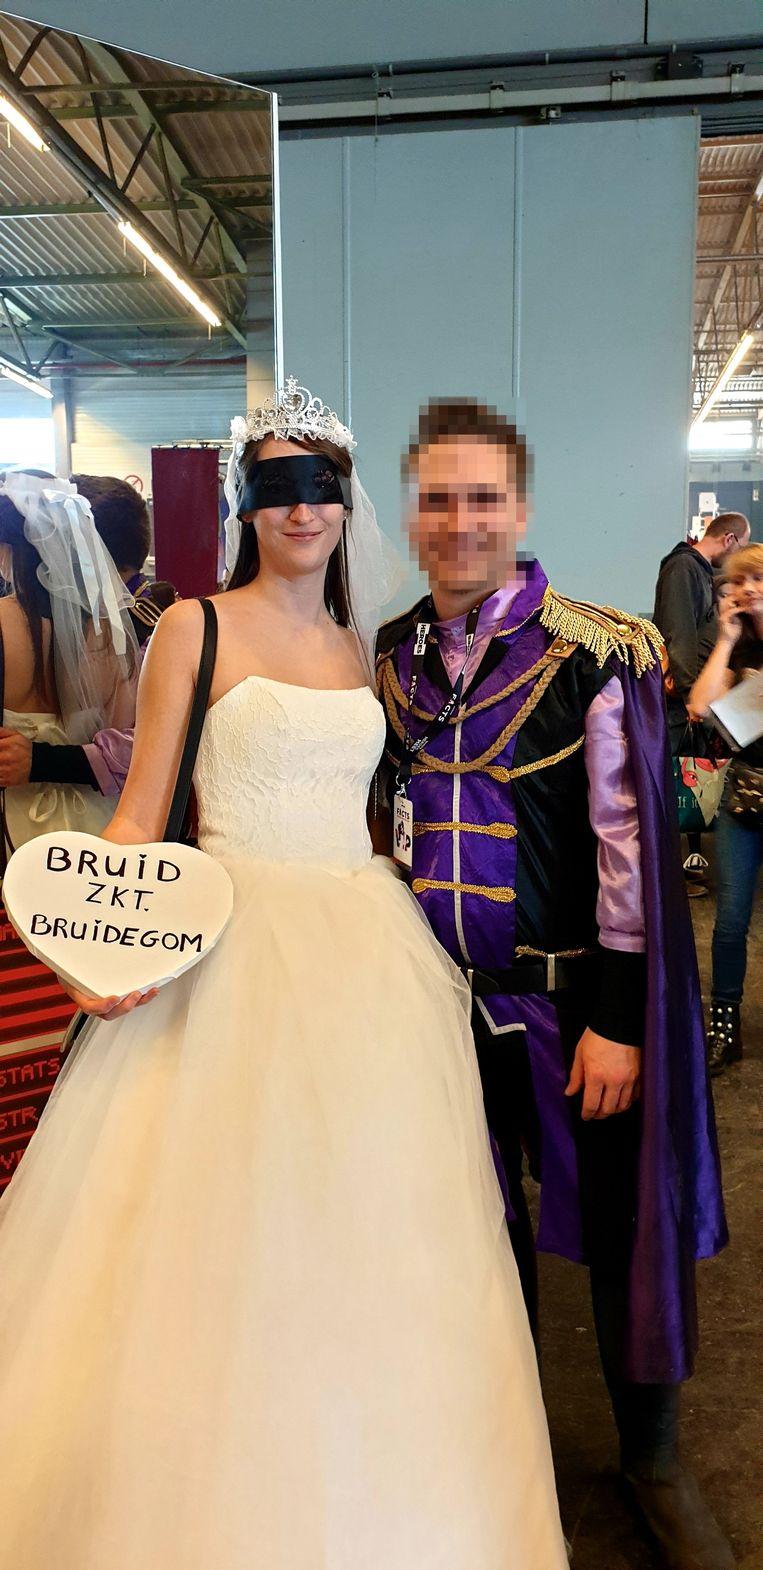 De blind getrouwde bruid en haar prins.